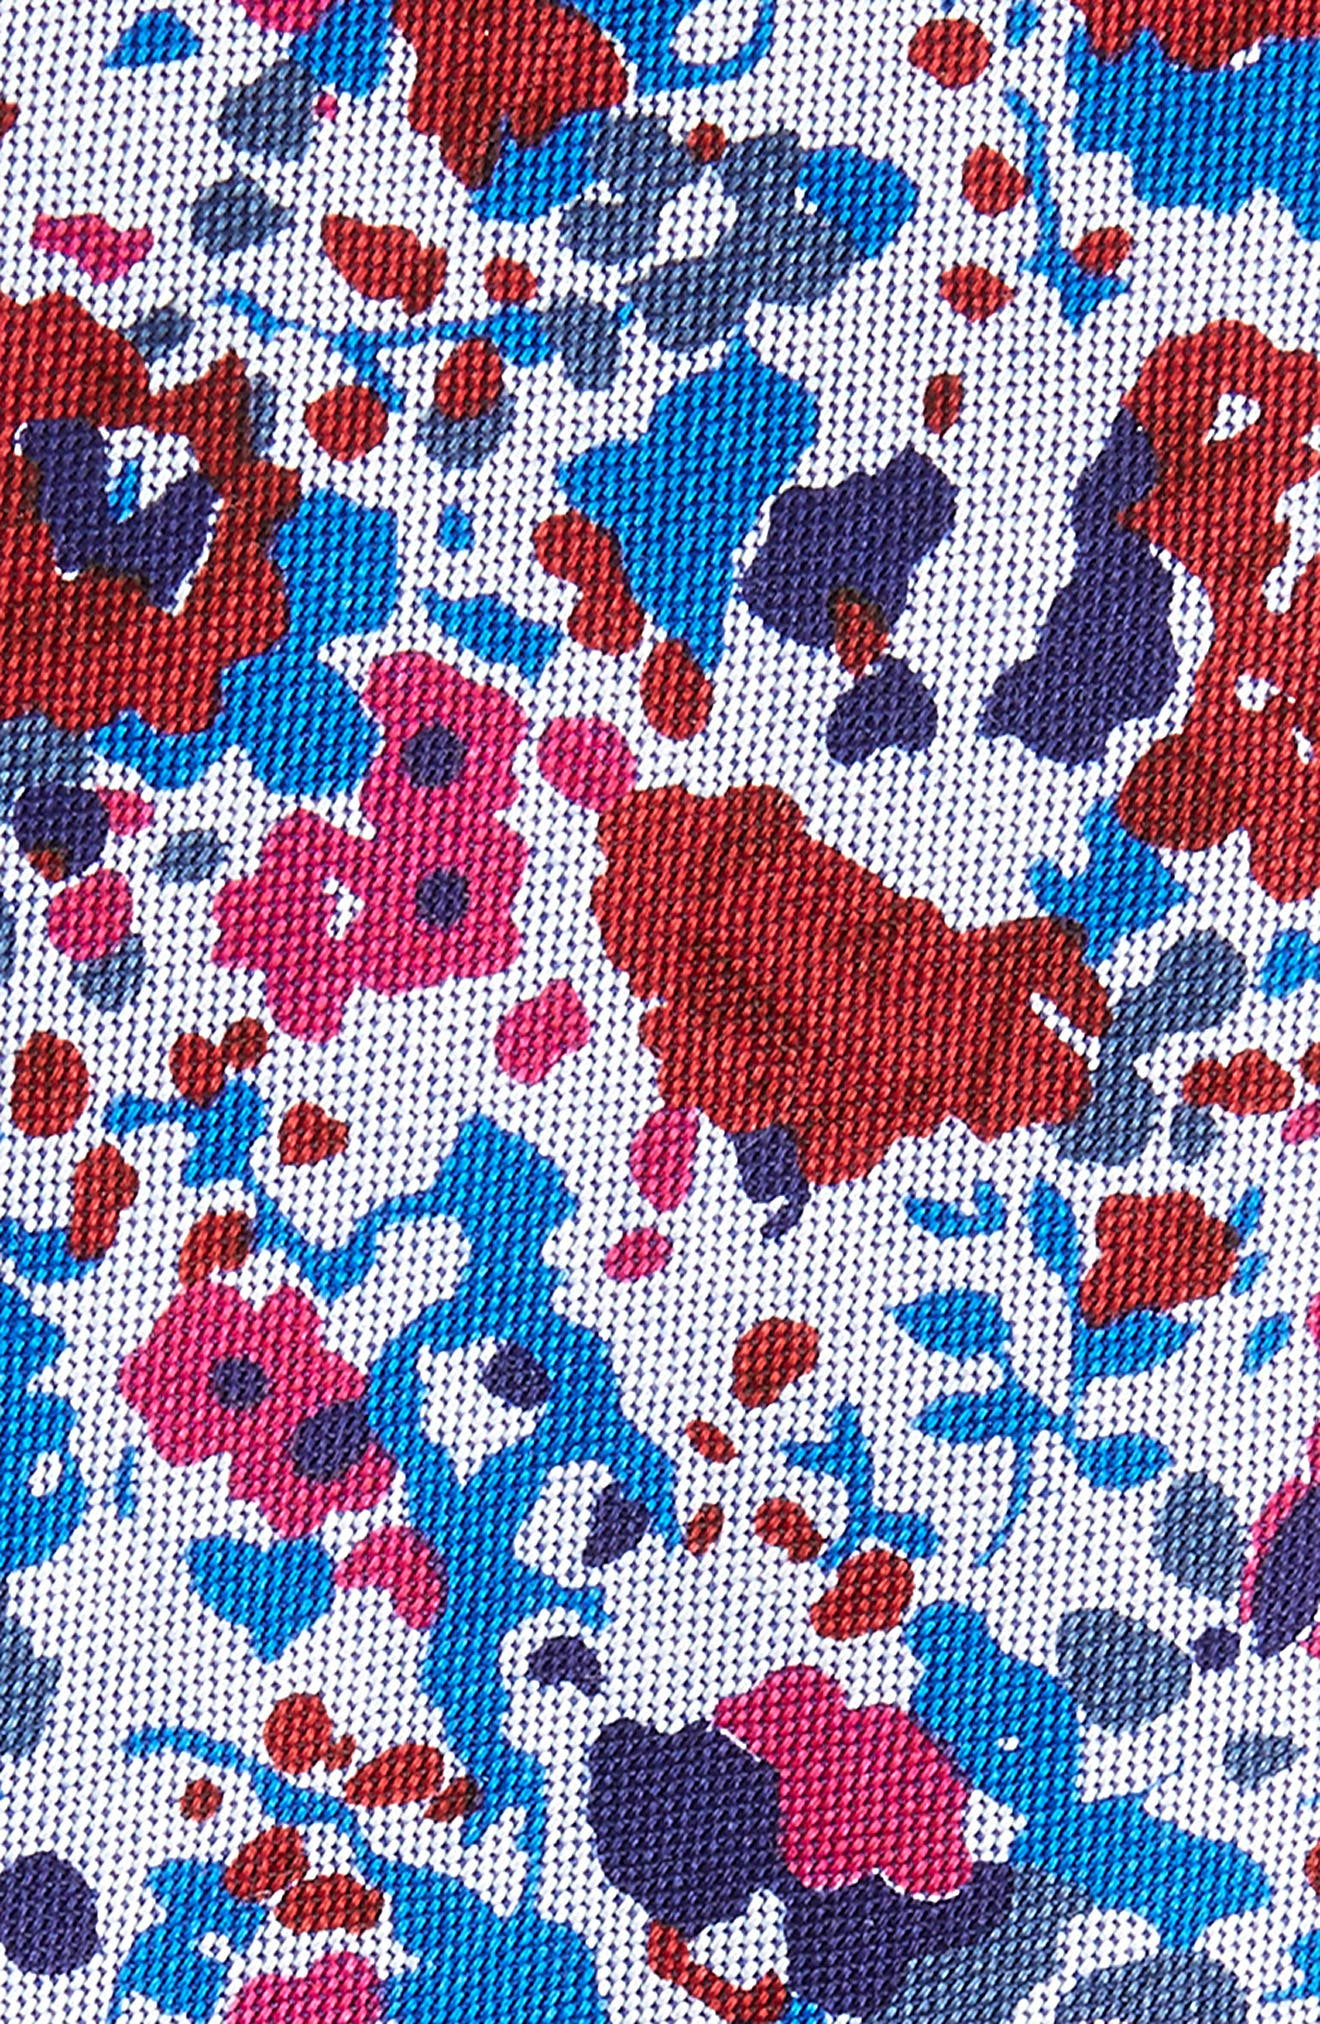 Ajax Floral Cotton Skinny Tie,                             Alternate thumbnail 2, color,                             600